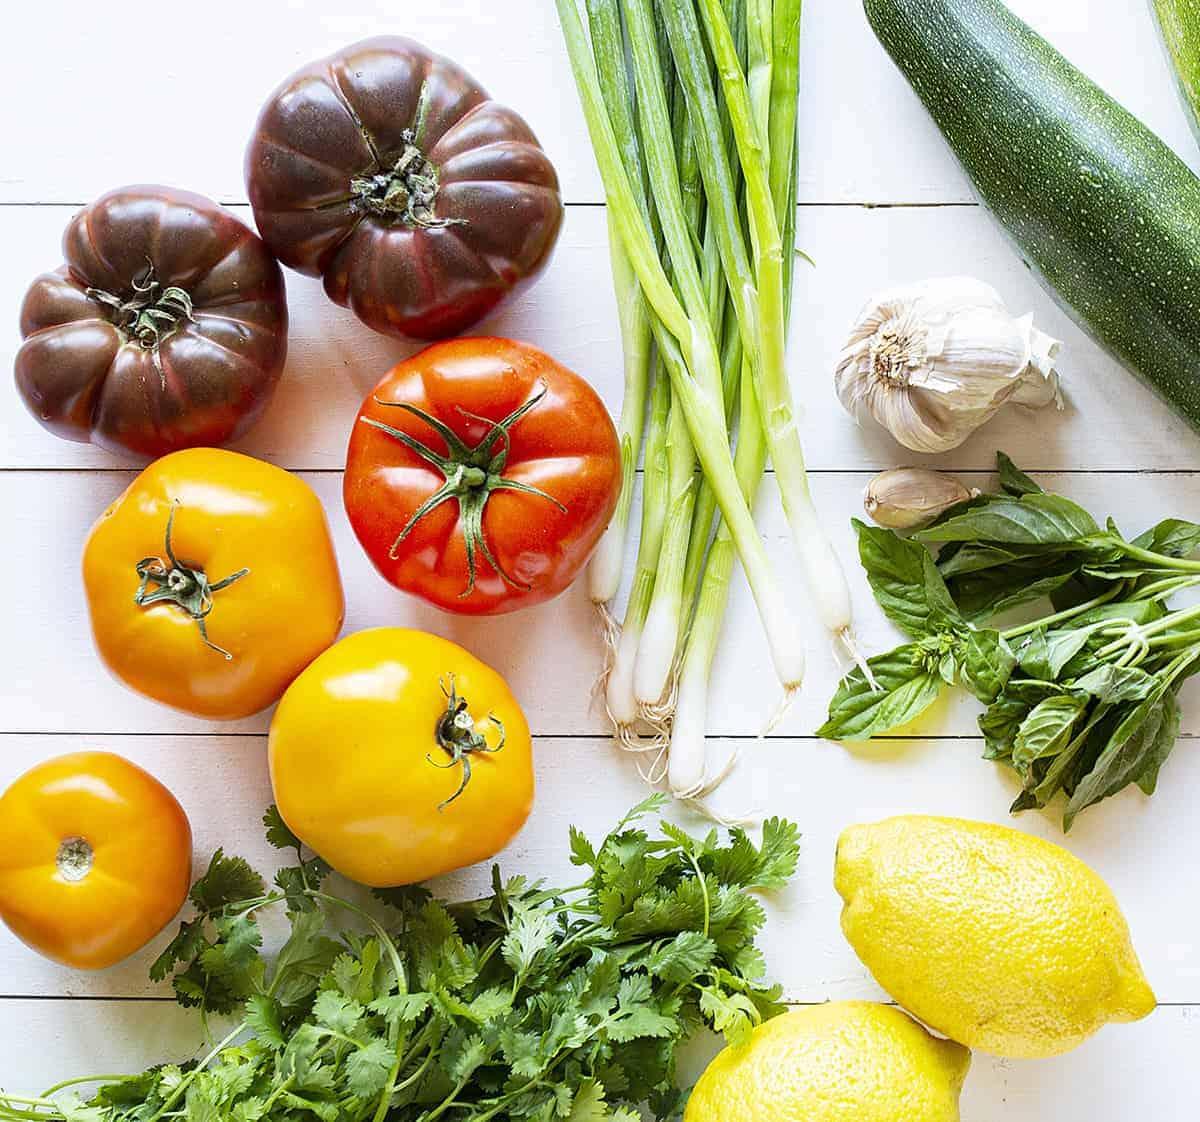 Ingredients for Tomato Pie